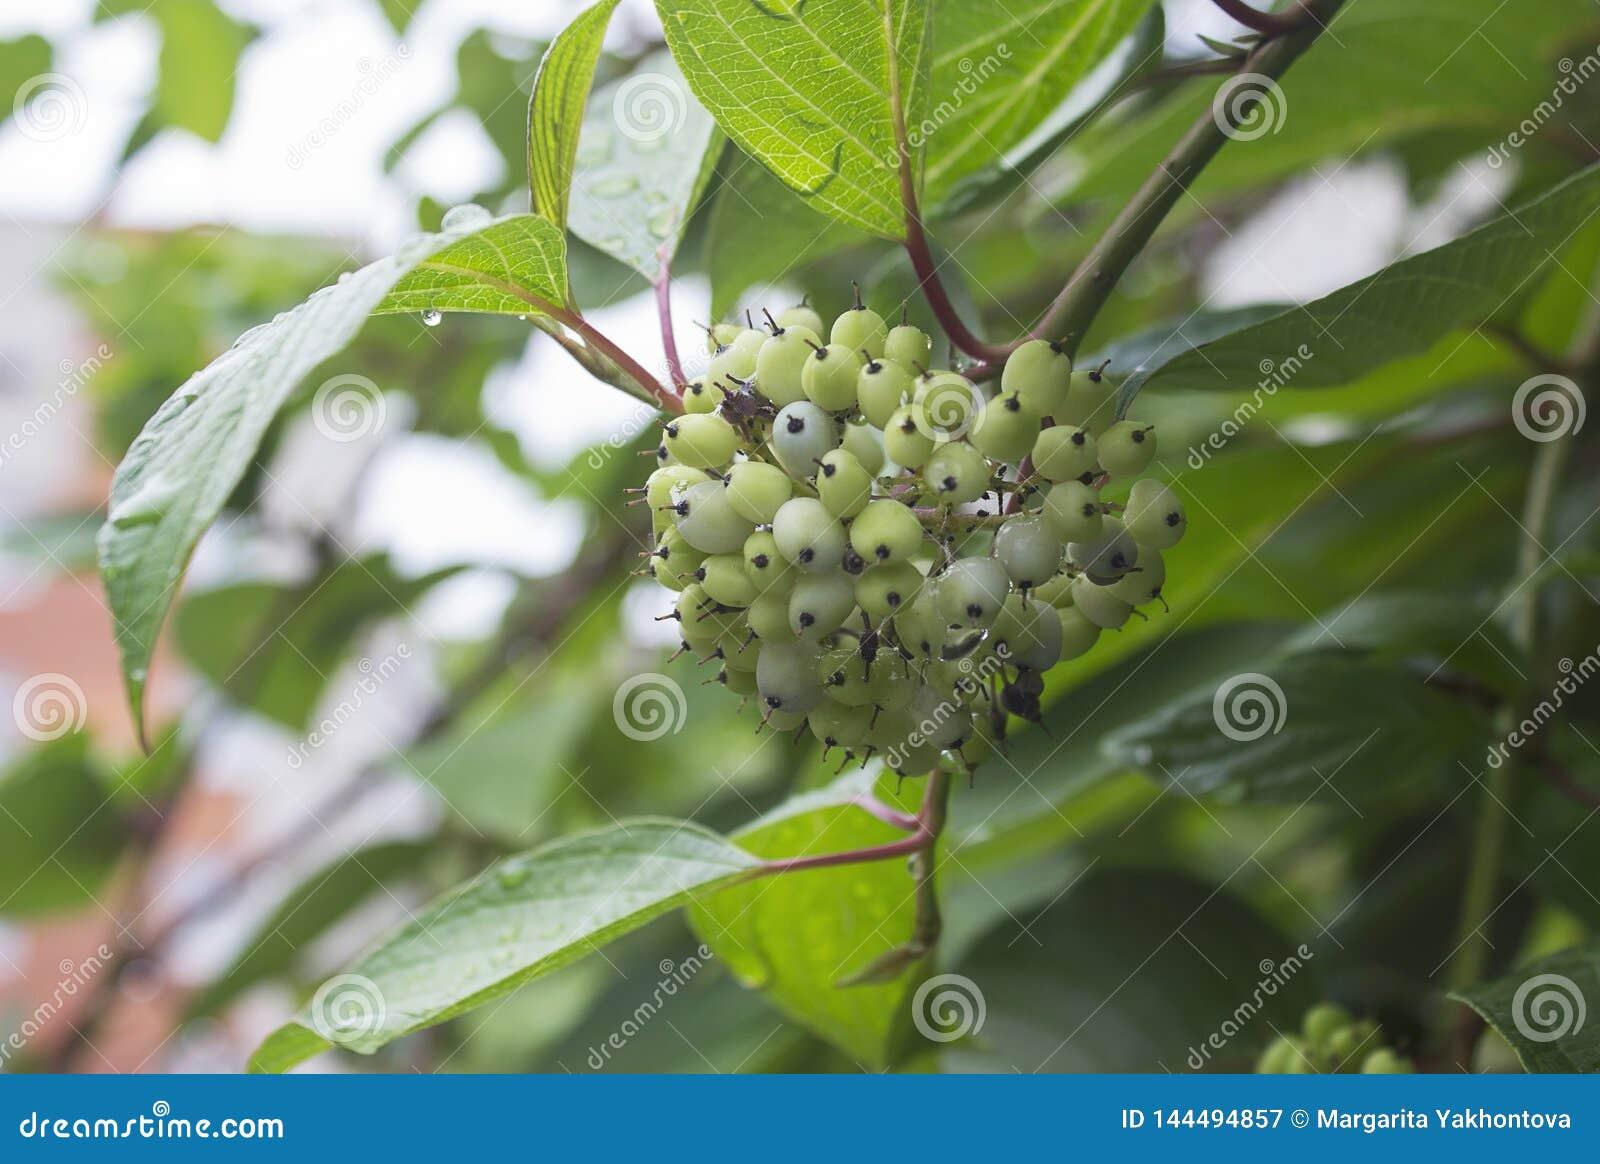 Пук зеленых ягод после дождя